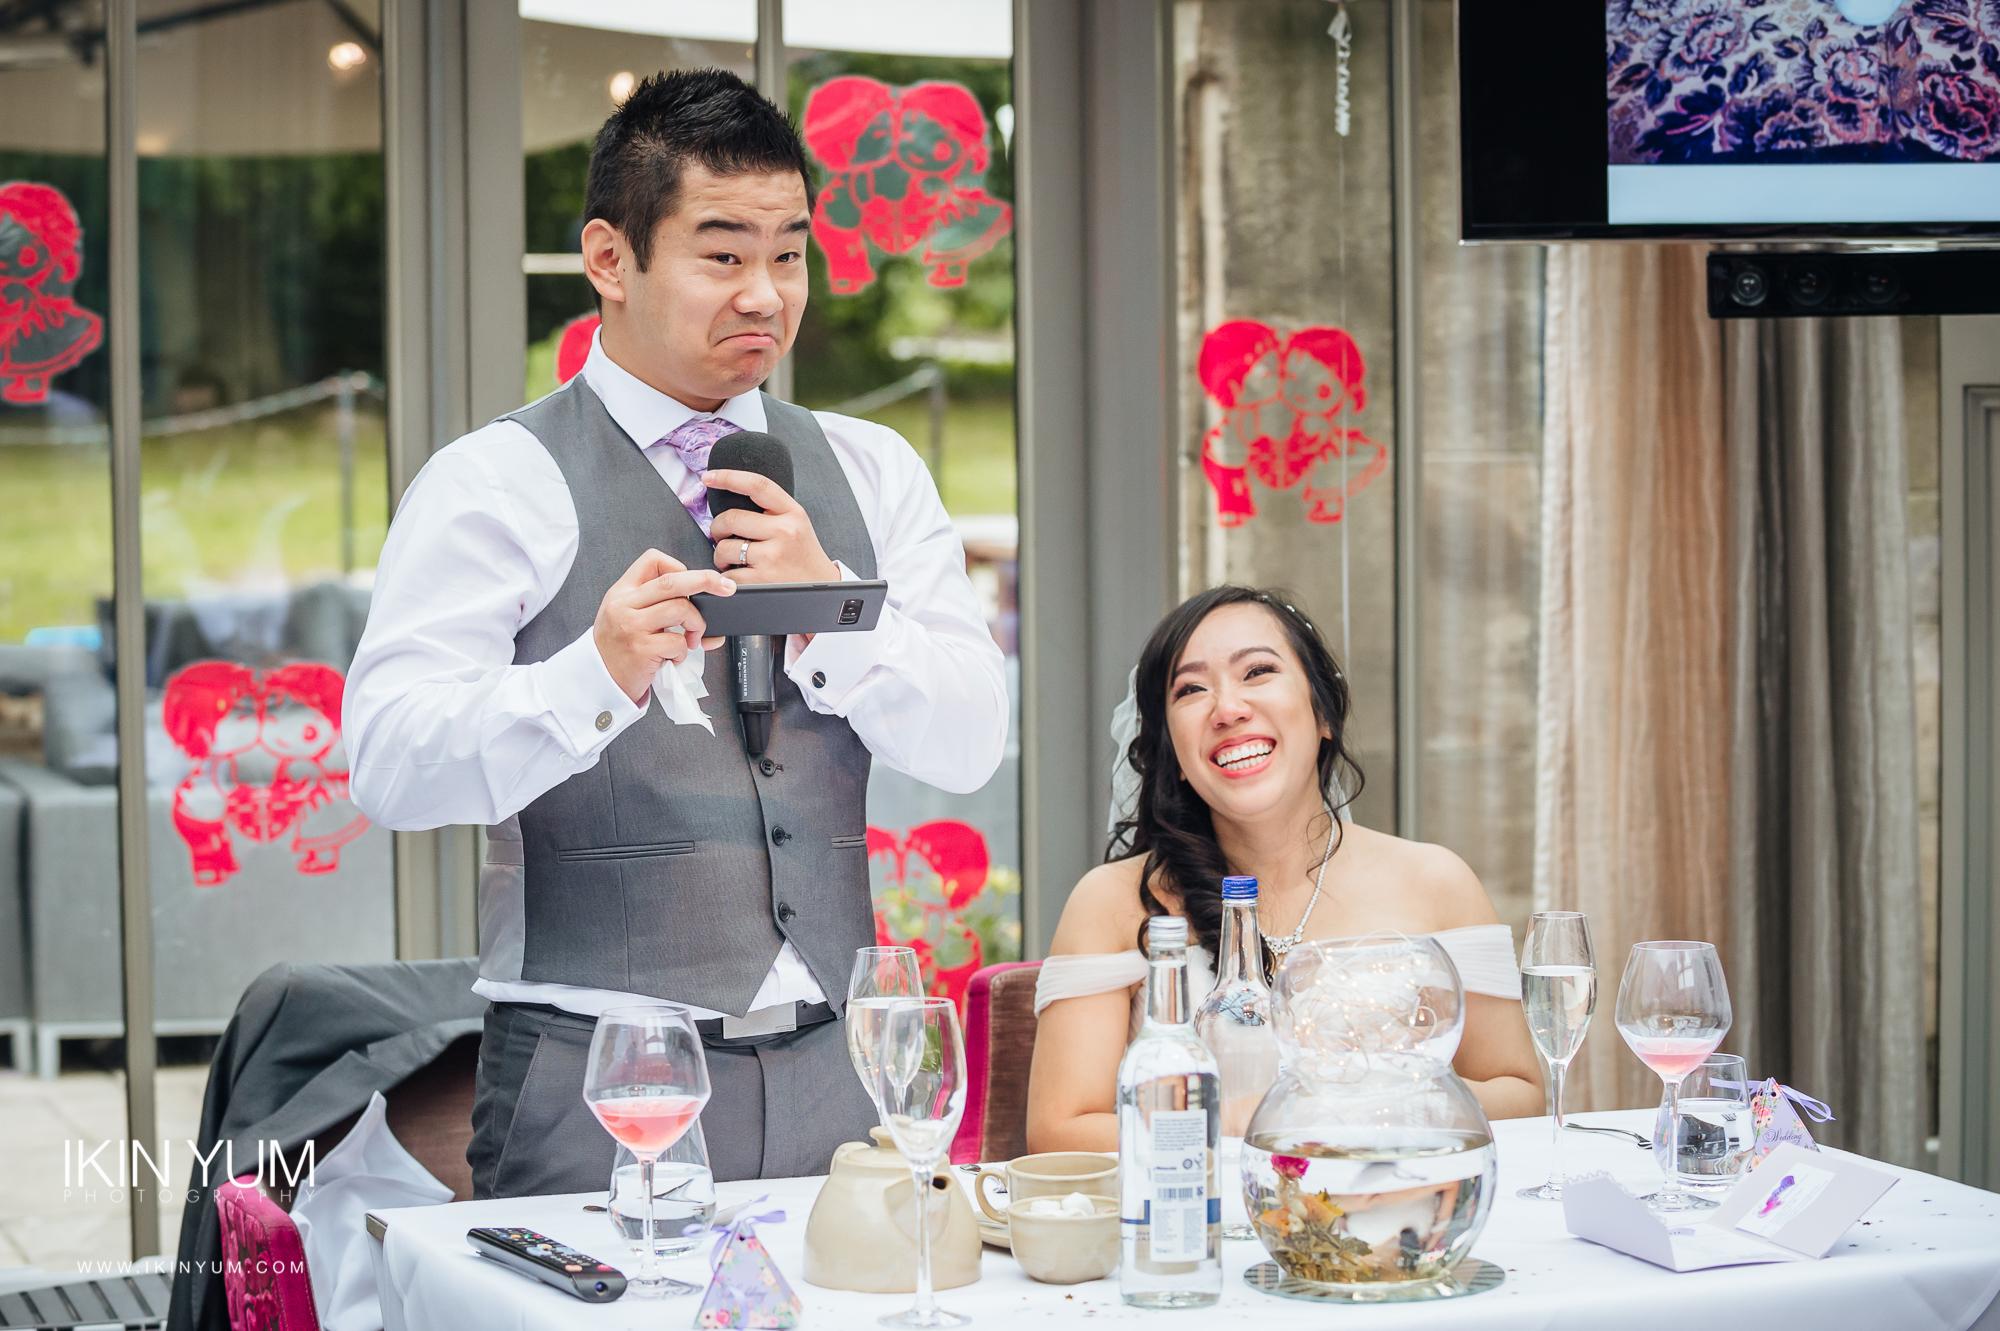 Hampton Manor Wedding - Ikin Yum Photography -143.jpg